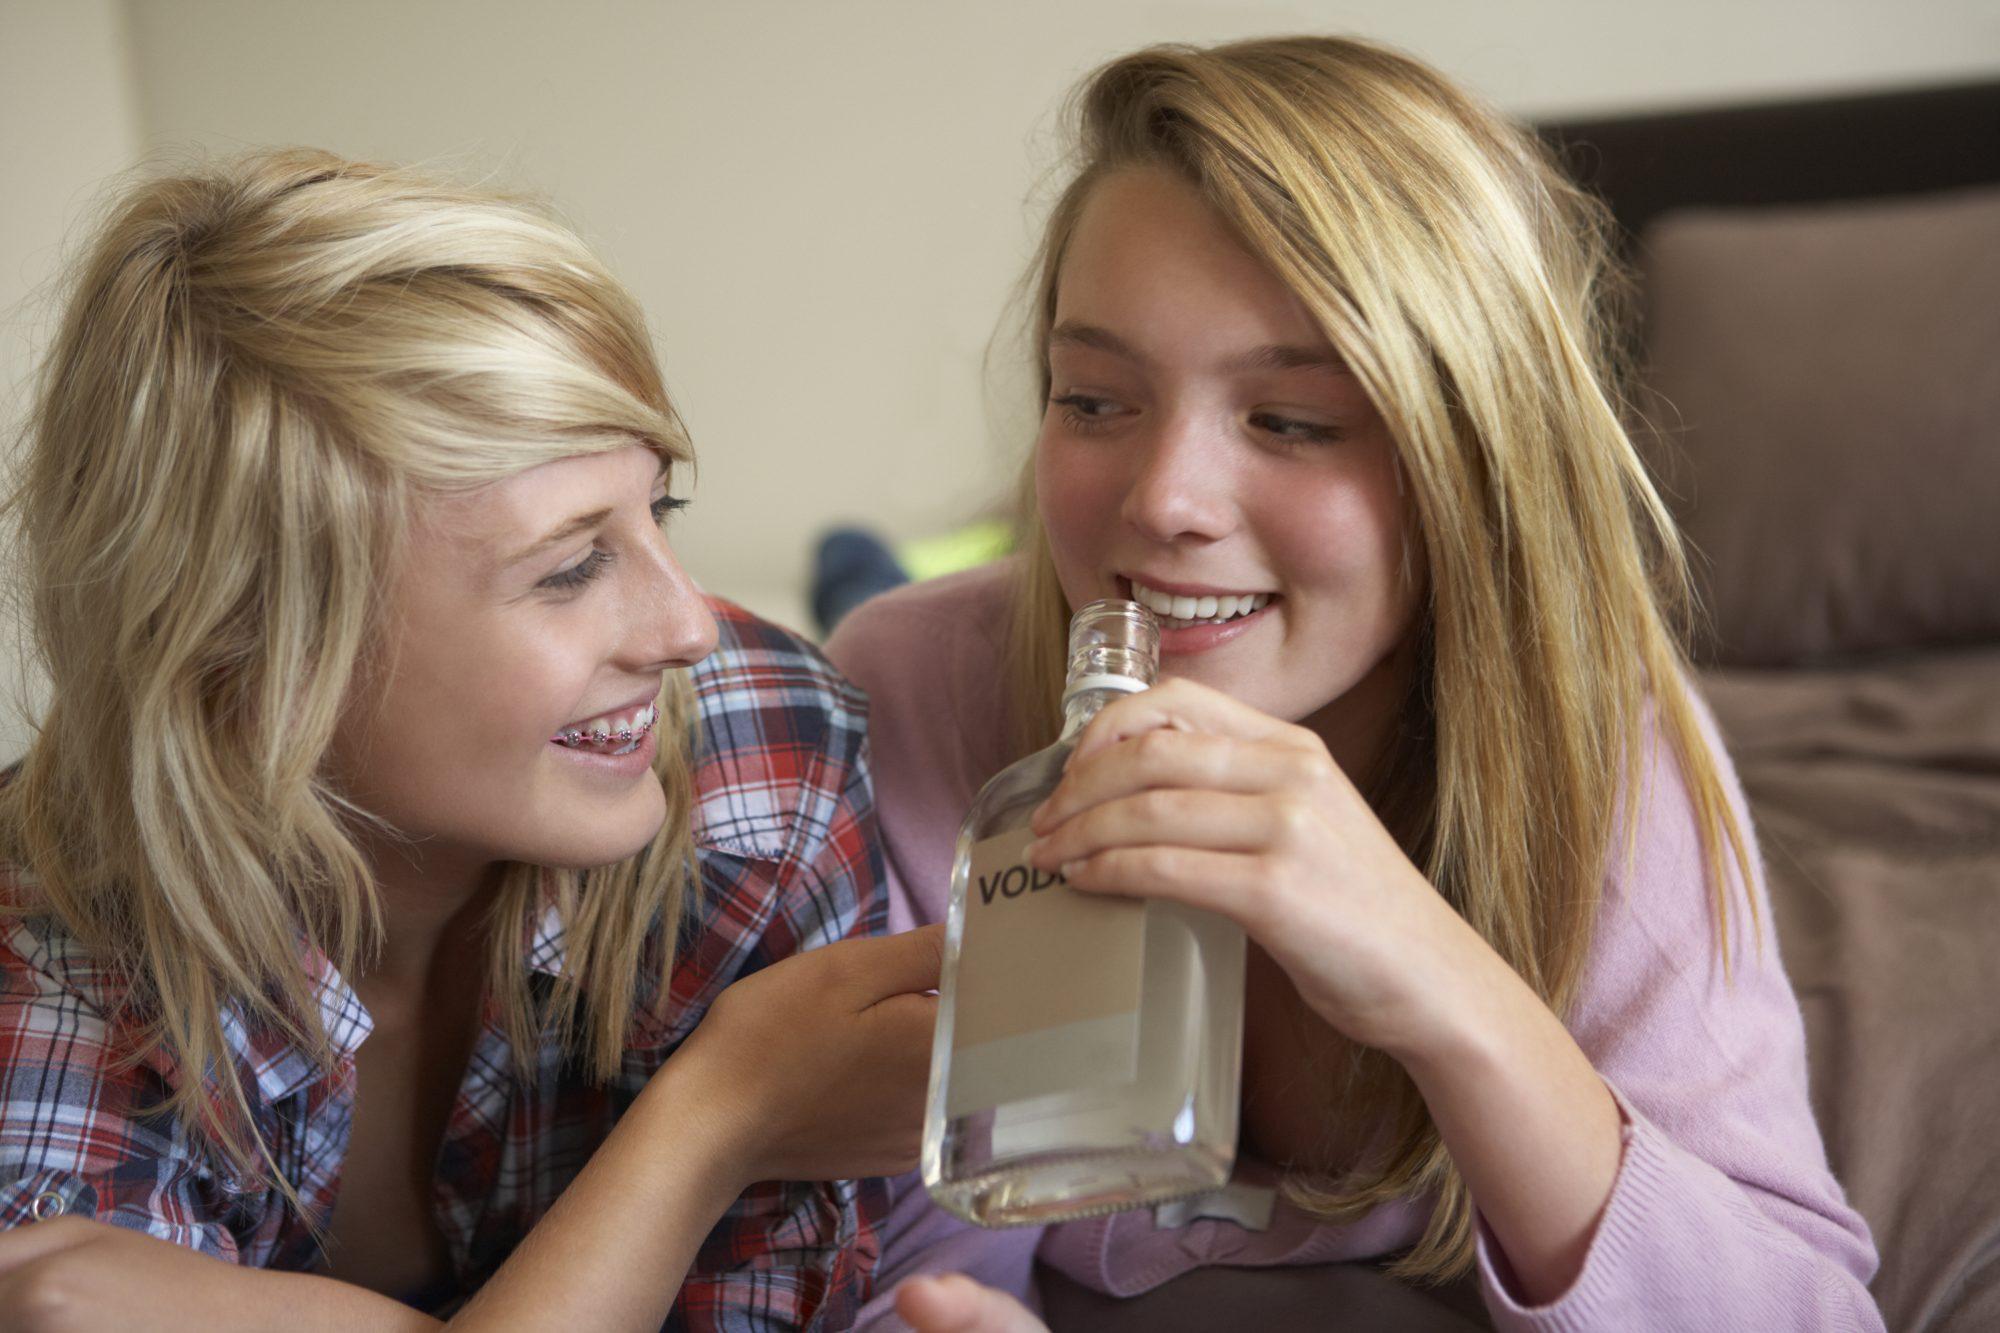 History of teen drinking